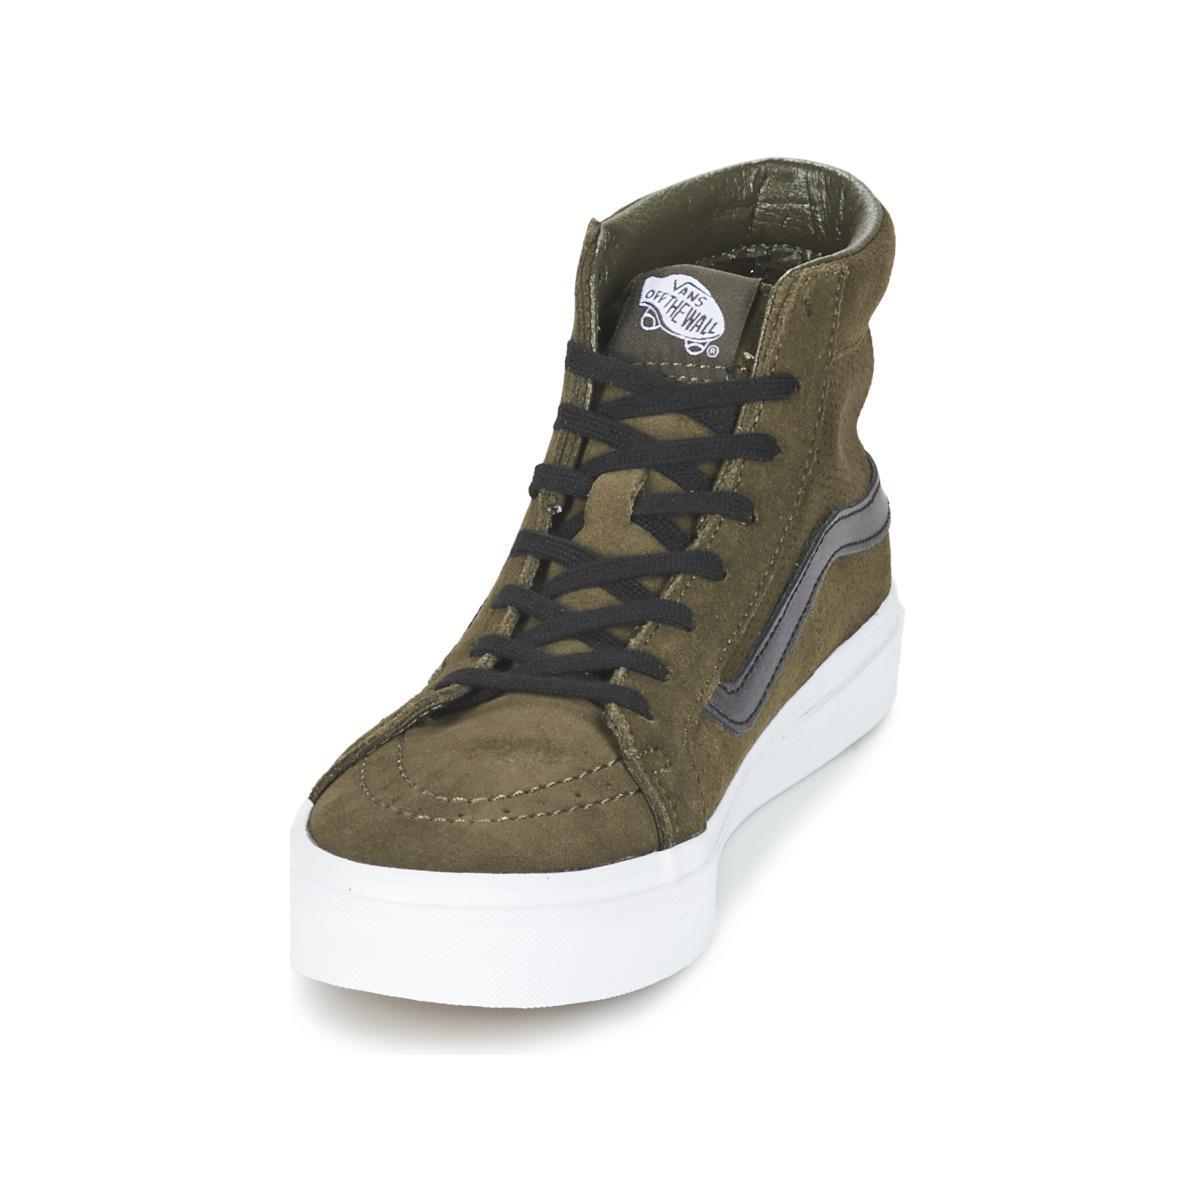 4c33aba3dd Vans Sk8-hi Slim Cutout Shoes (high-top Trainers) in Green - Lyst